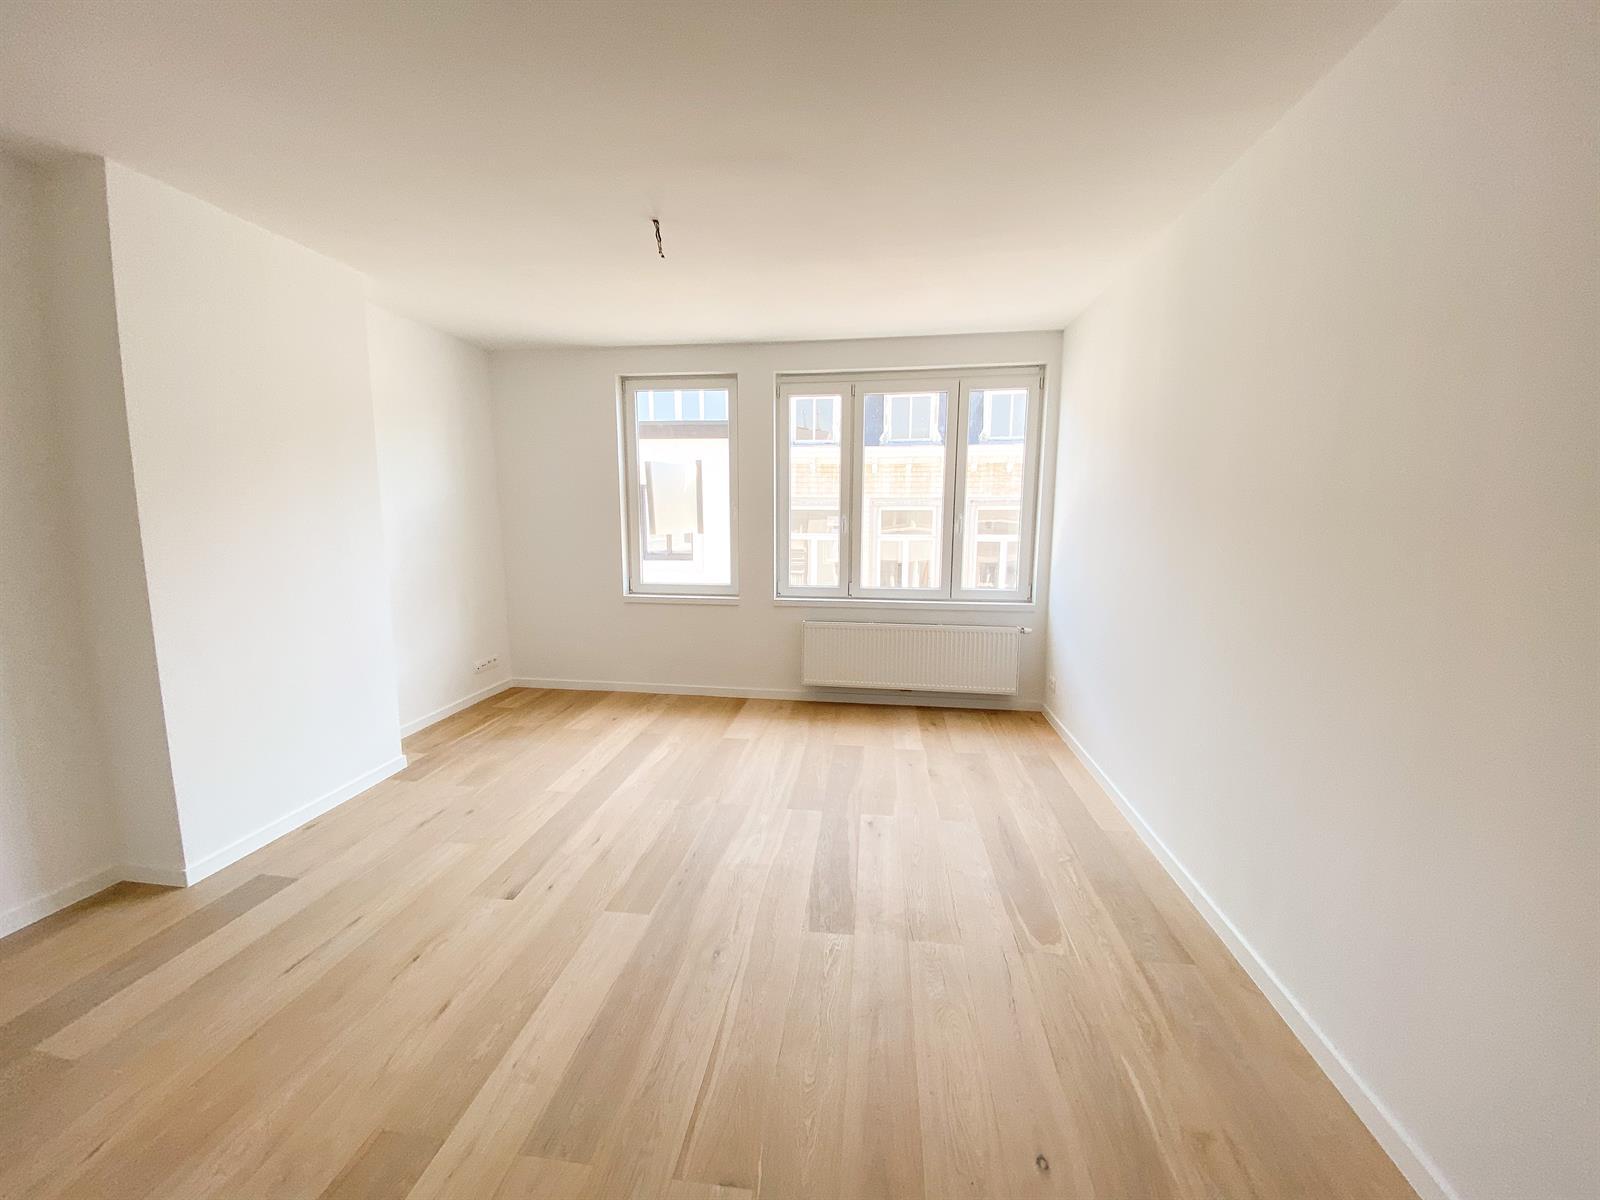 Appartement - Liège - #4045803-4